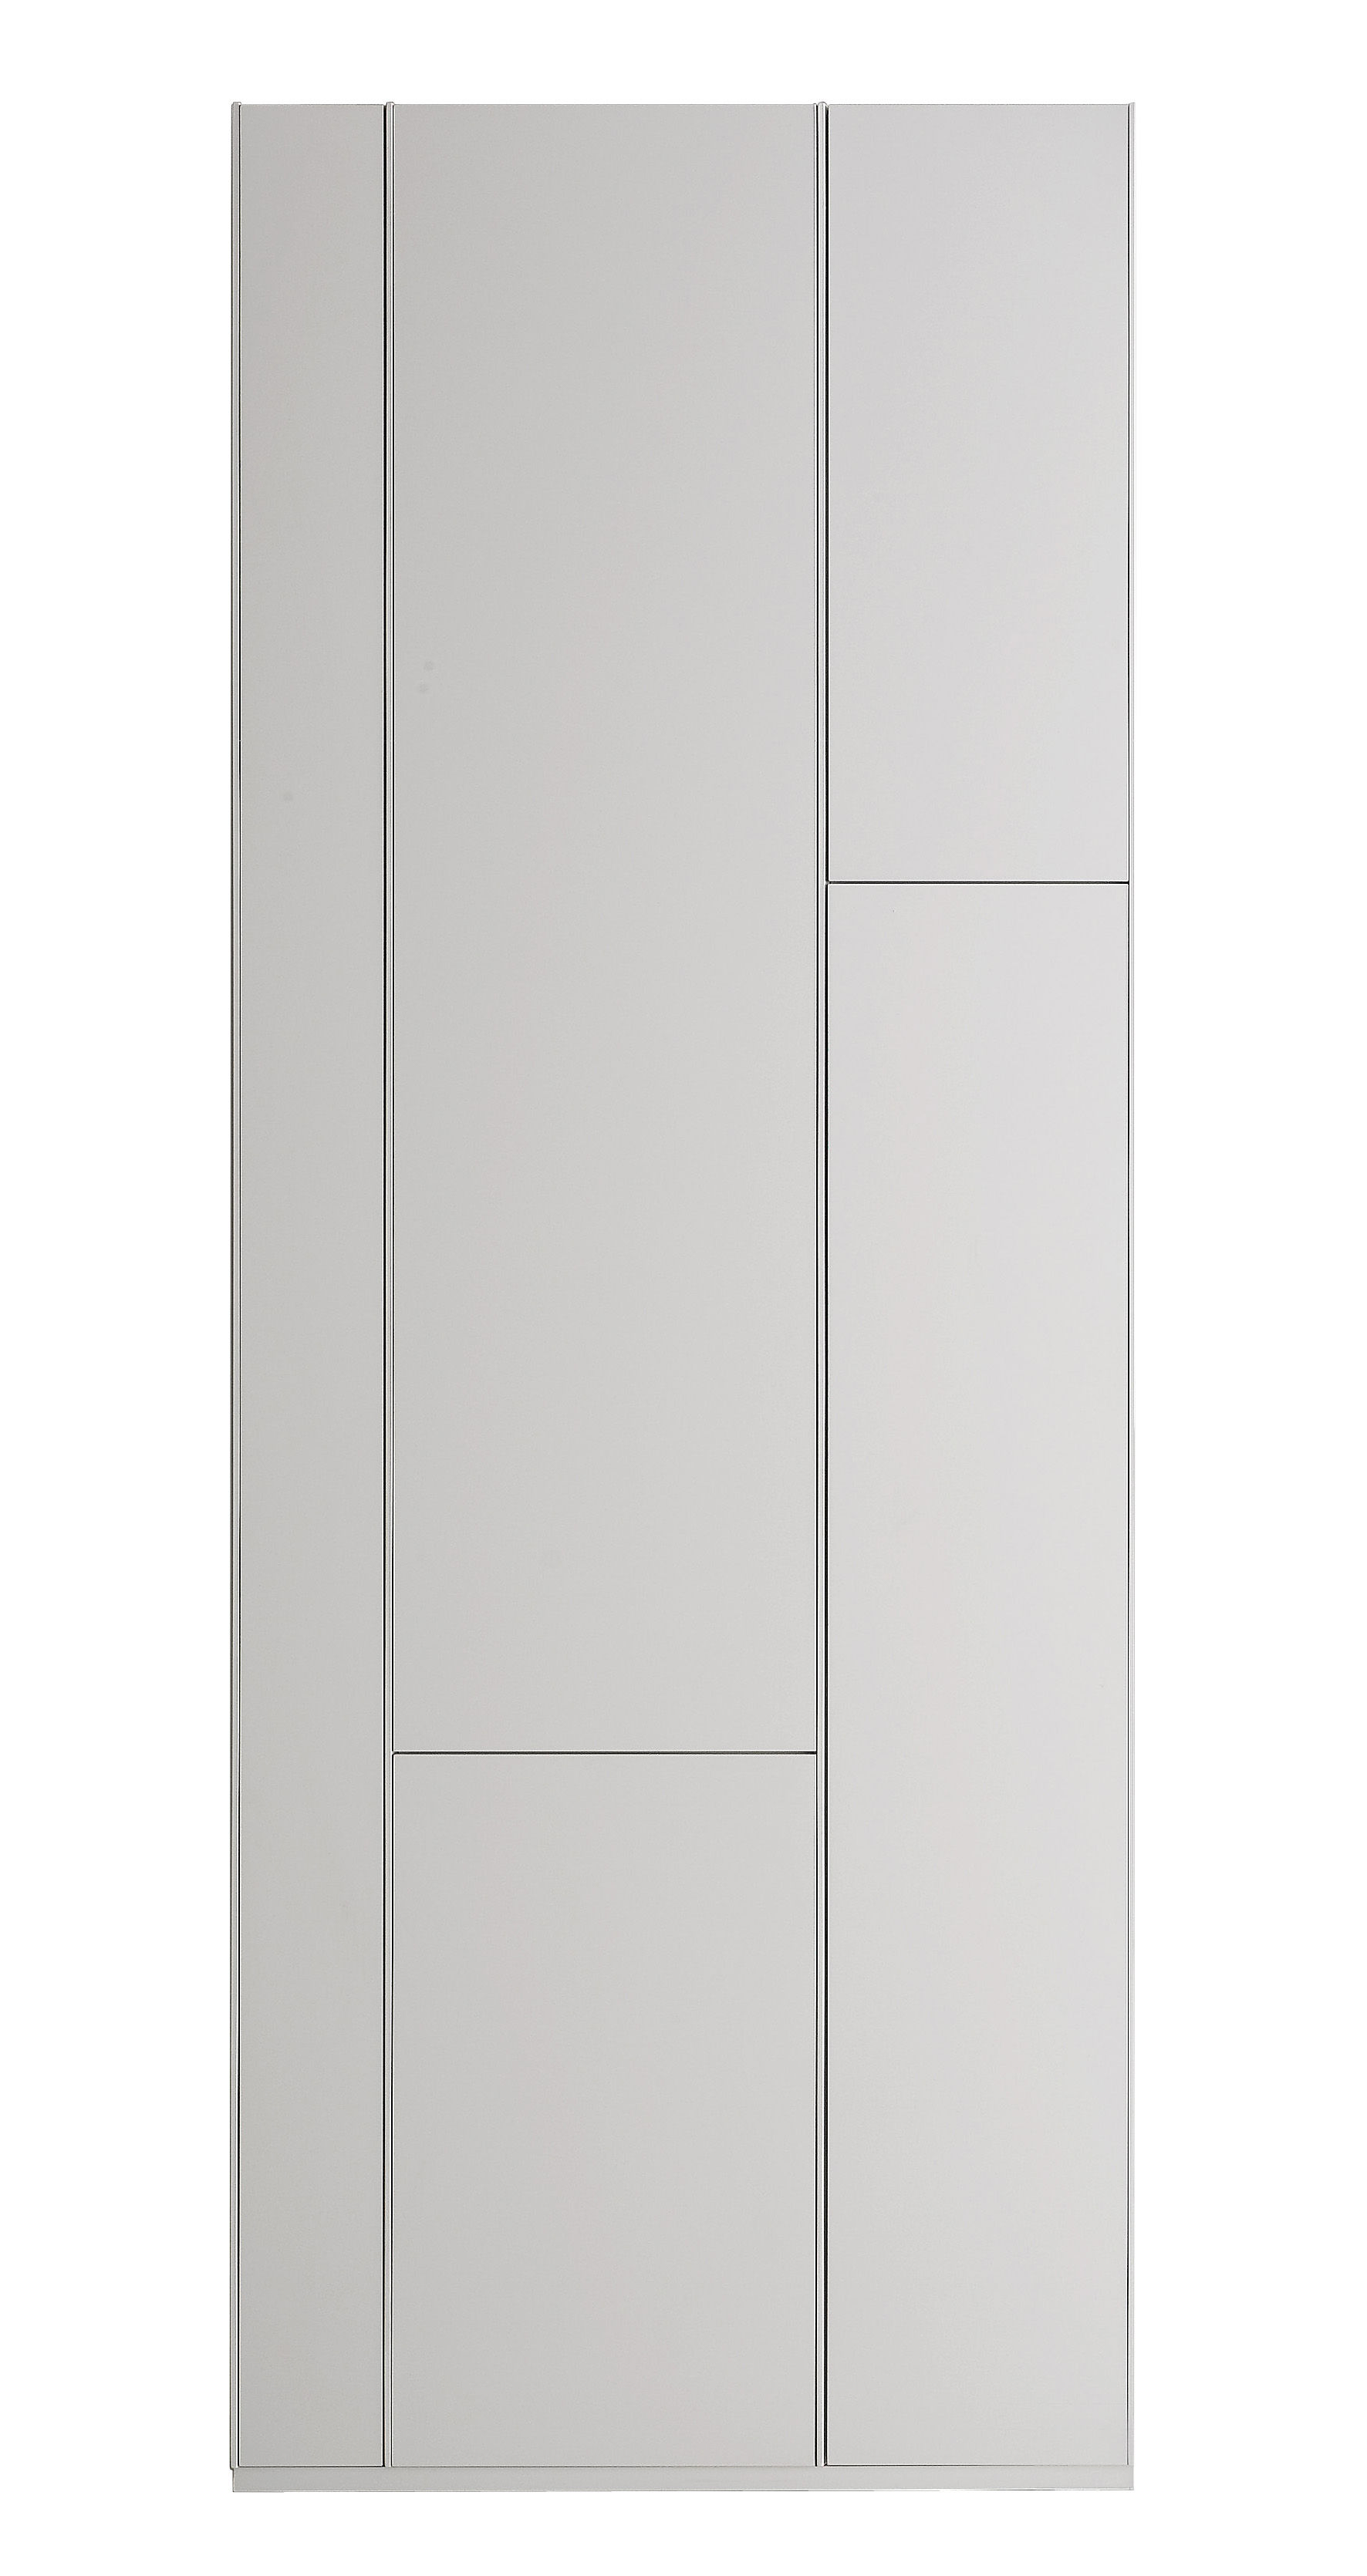 Furniture - Bookcases & Bookshelves - Random Cabinet Bookcase - Storage unit / Bookcase by MDF Italia - White lacquered - Lacquered wood fibre